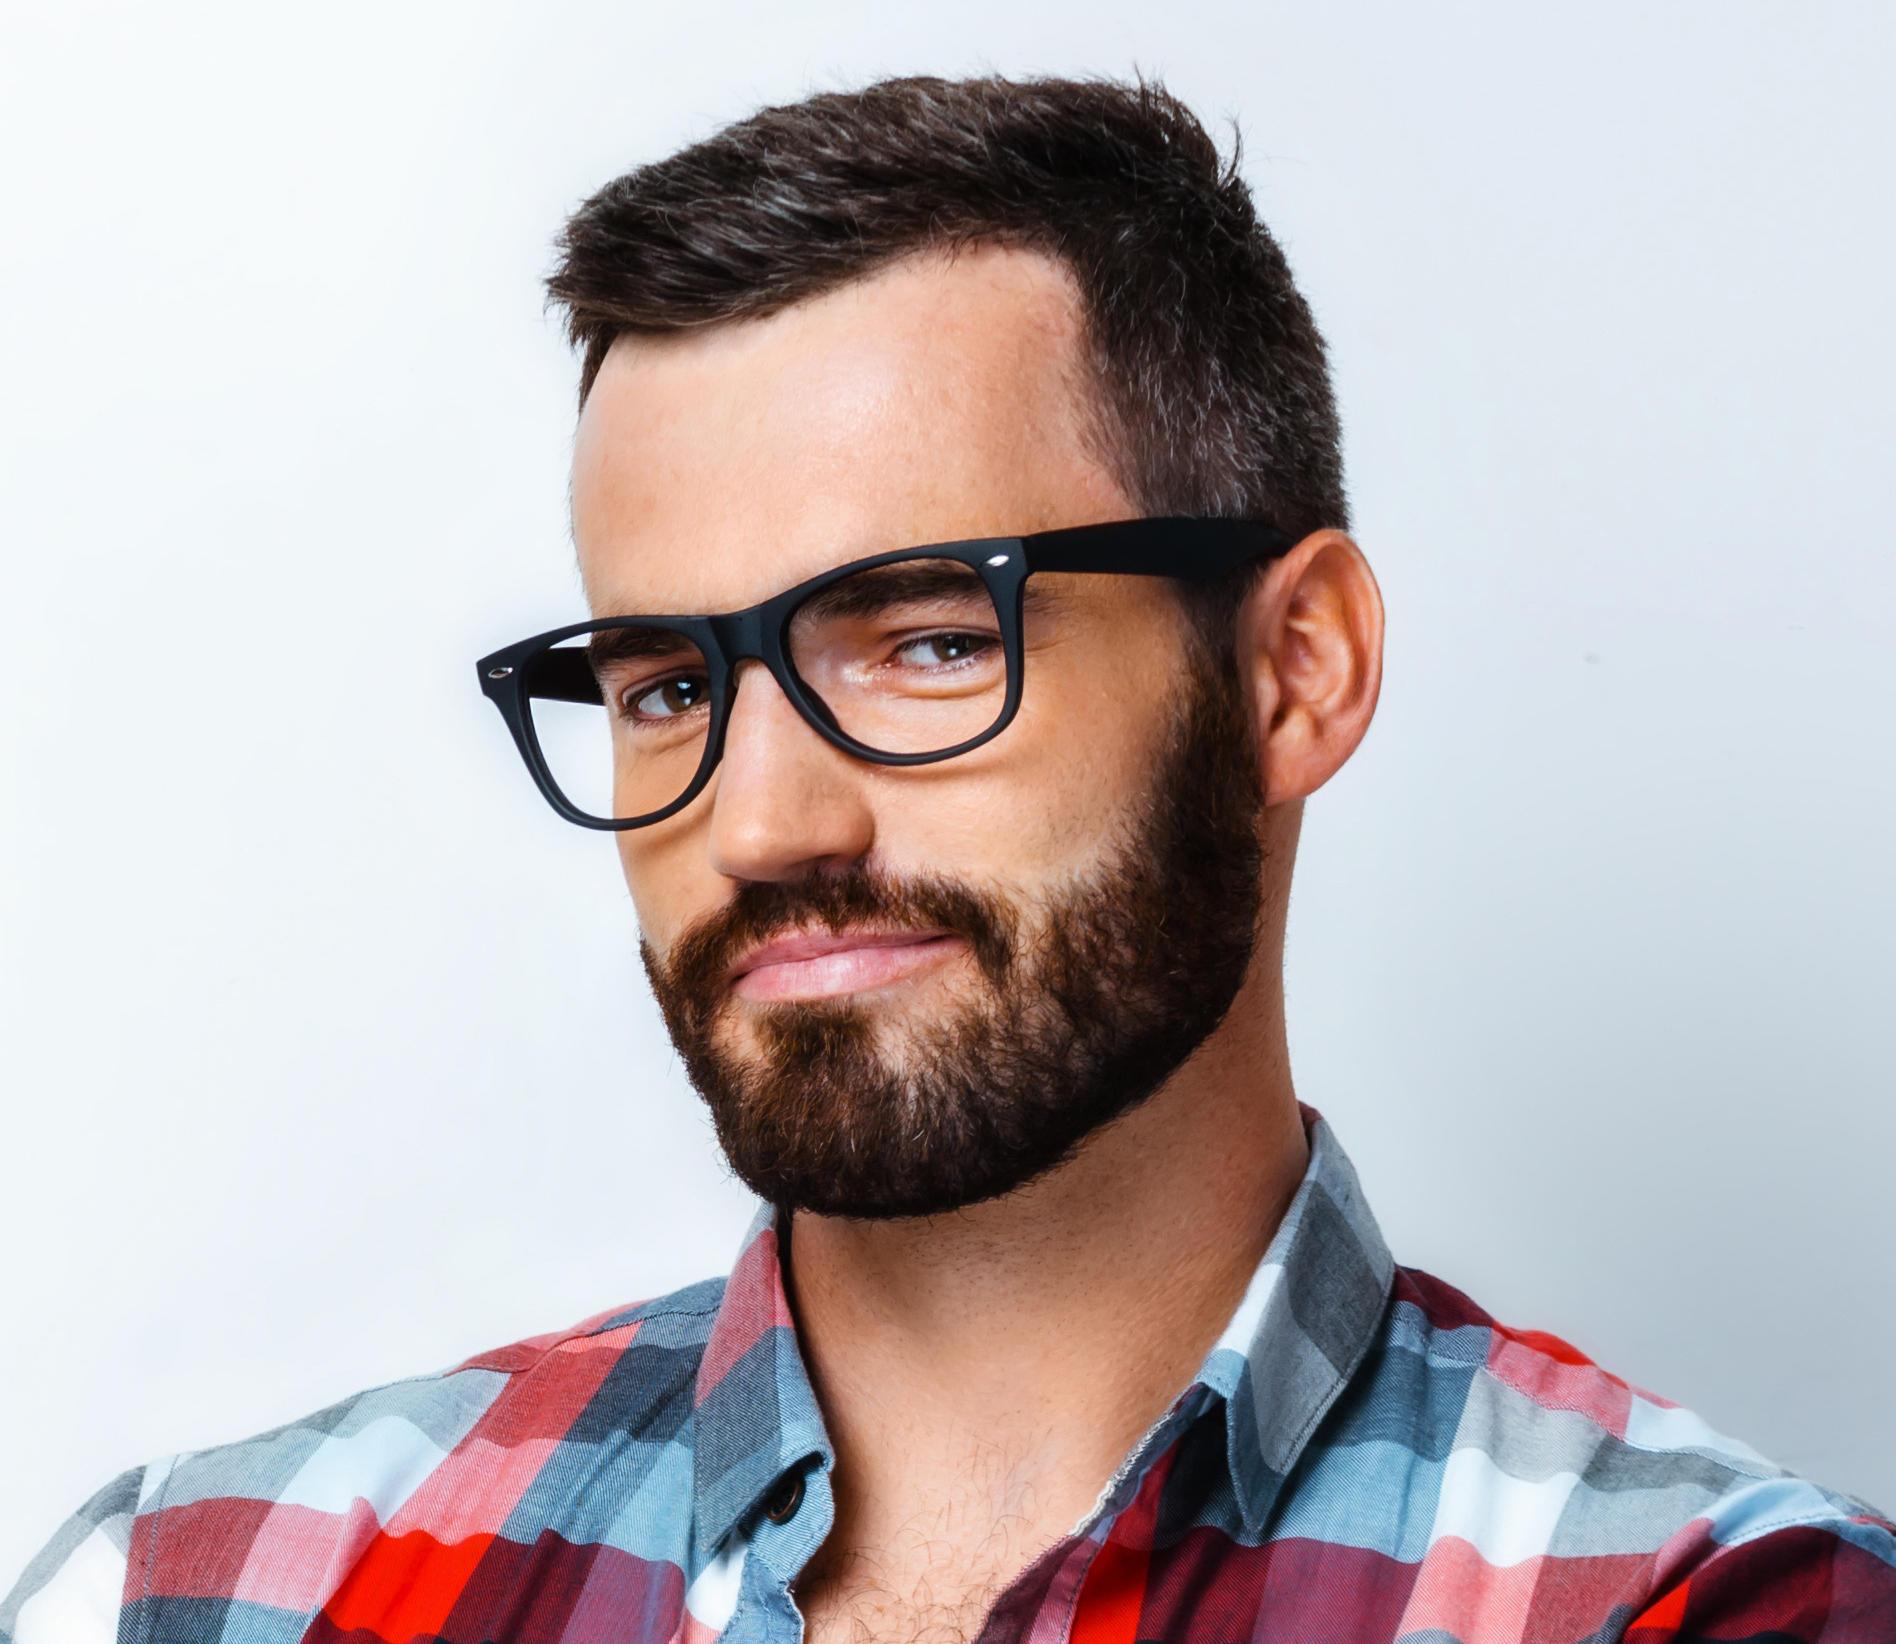 beard-face.jpg